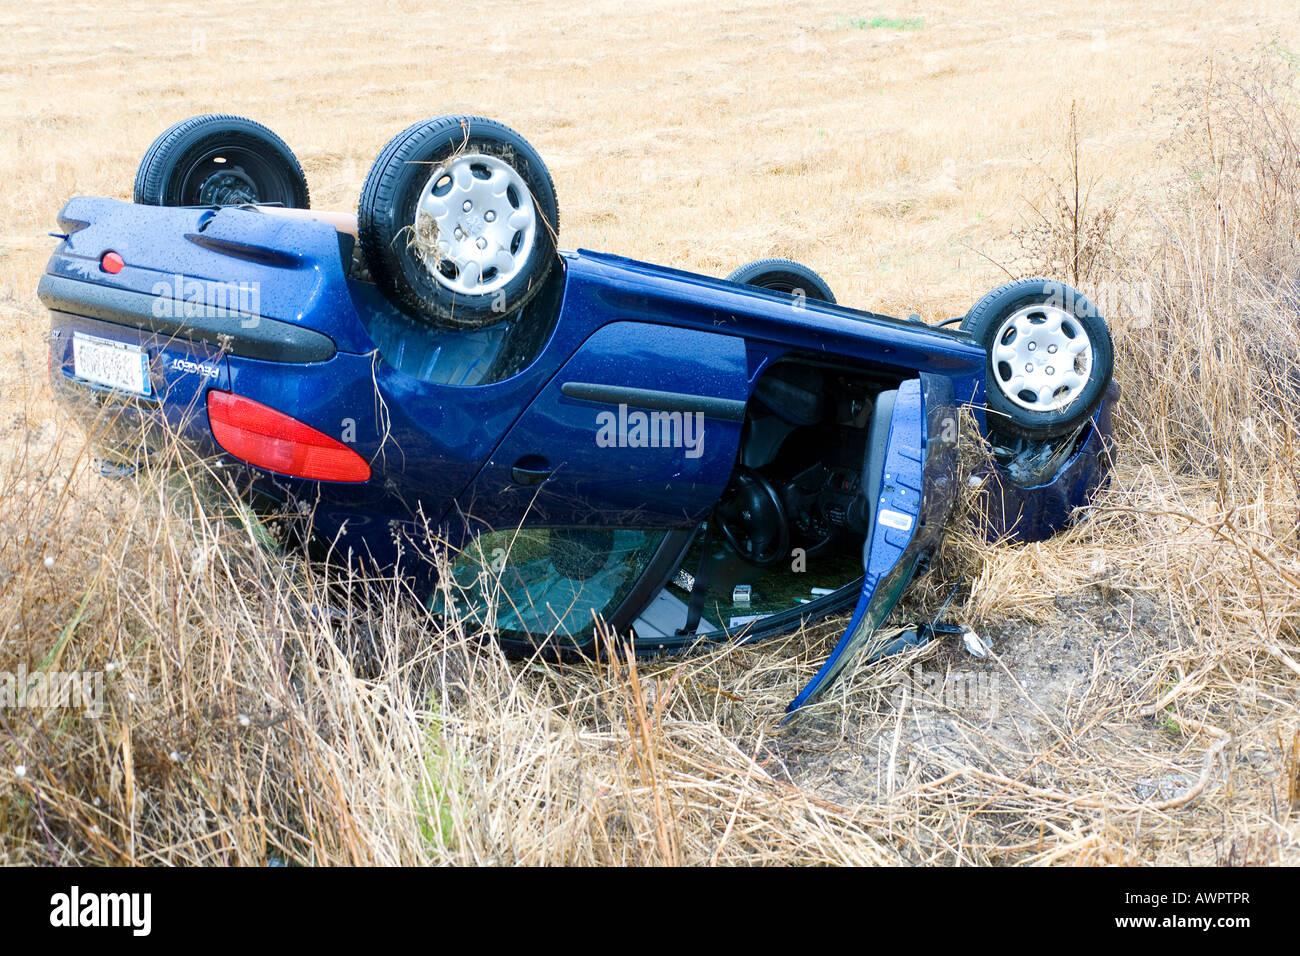 A crashed car - Stock Image